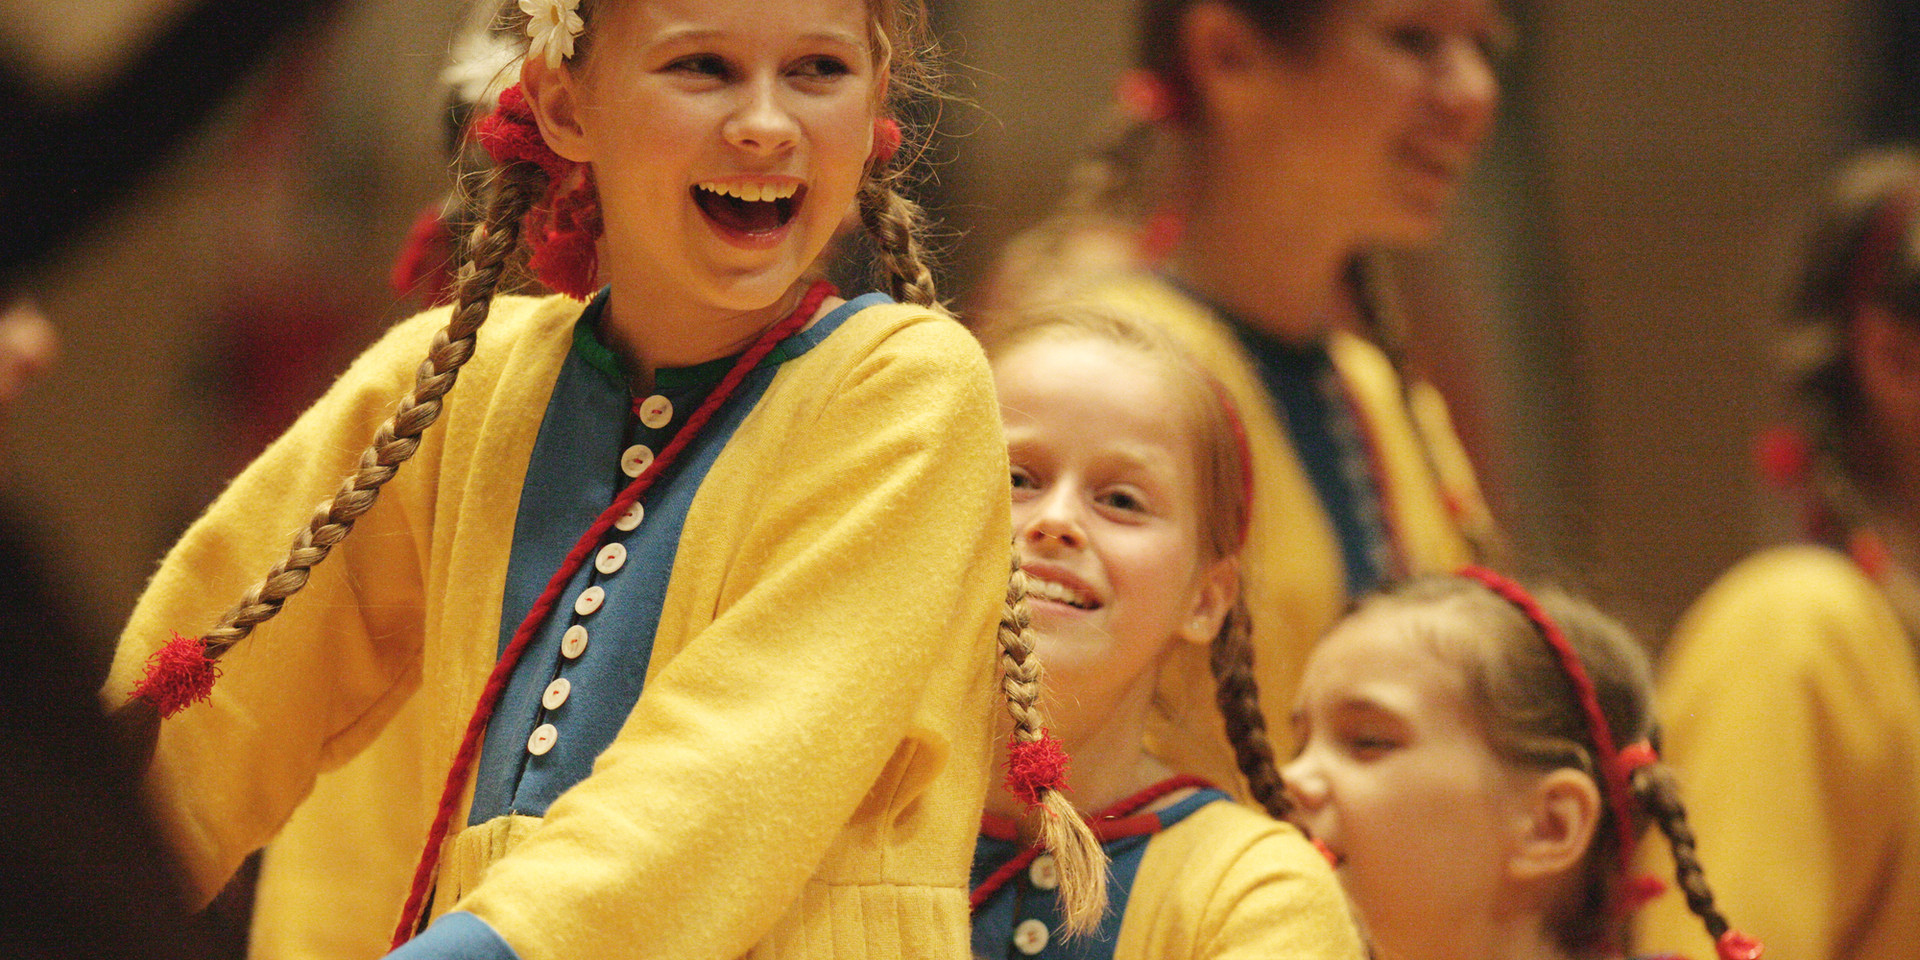 Estonian TV Young Children's Choir, 2006